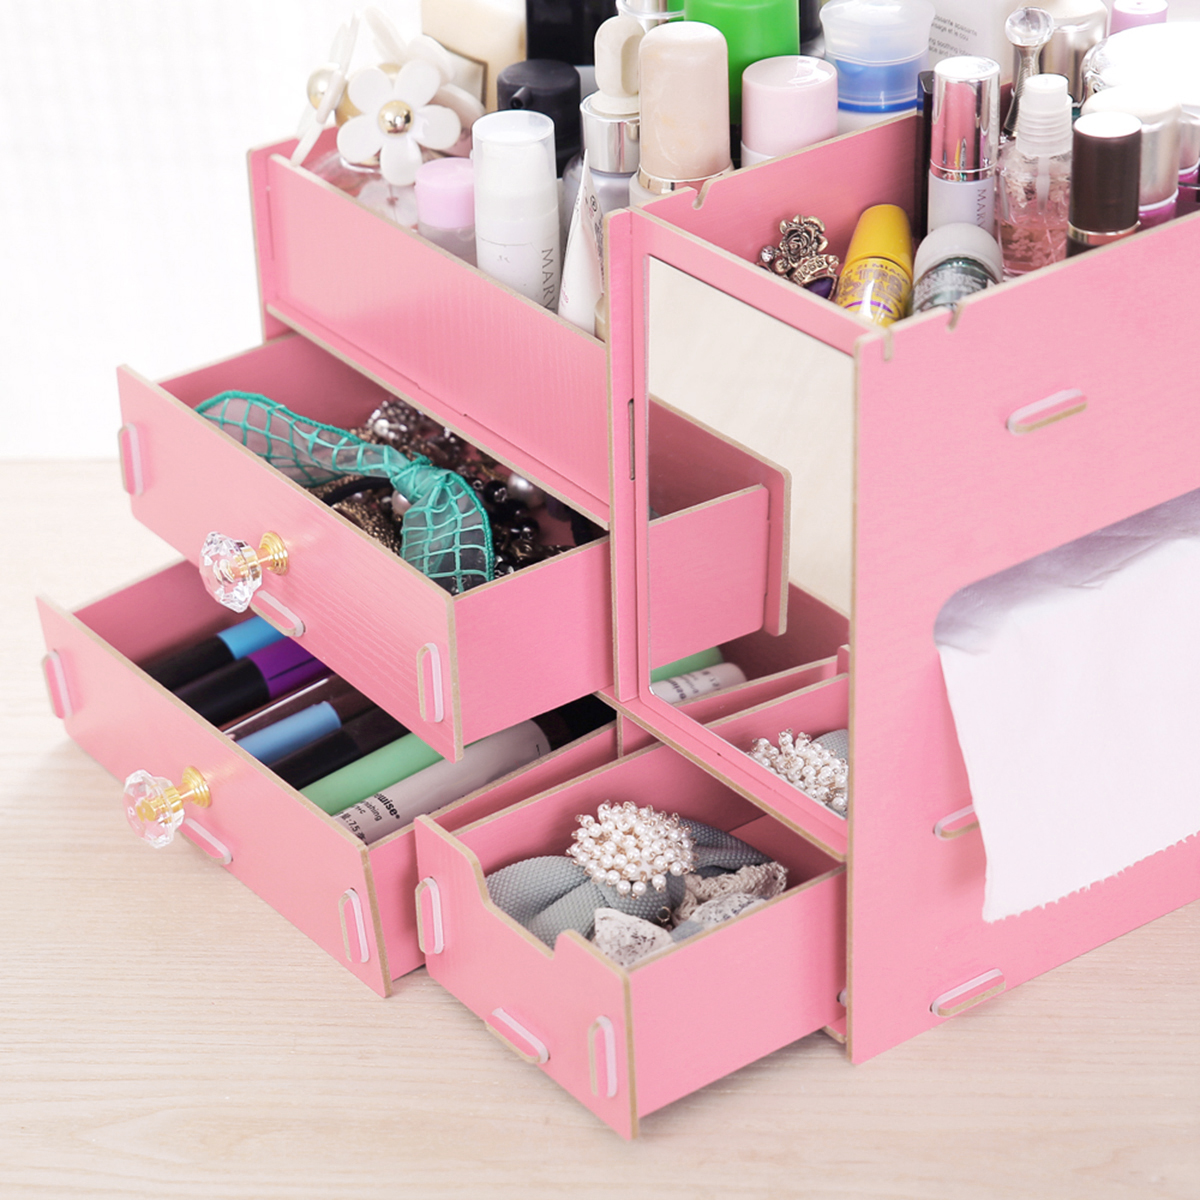 Cosmetics Storage Box Makeup Organizer Drawer Desktop Sundries Container with Mirror Nail Polish Lipstick Storage Box Jewelry Case